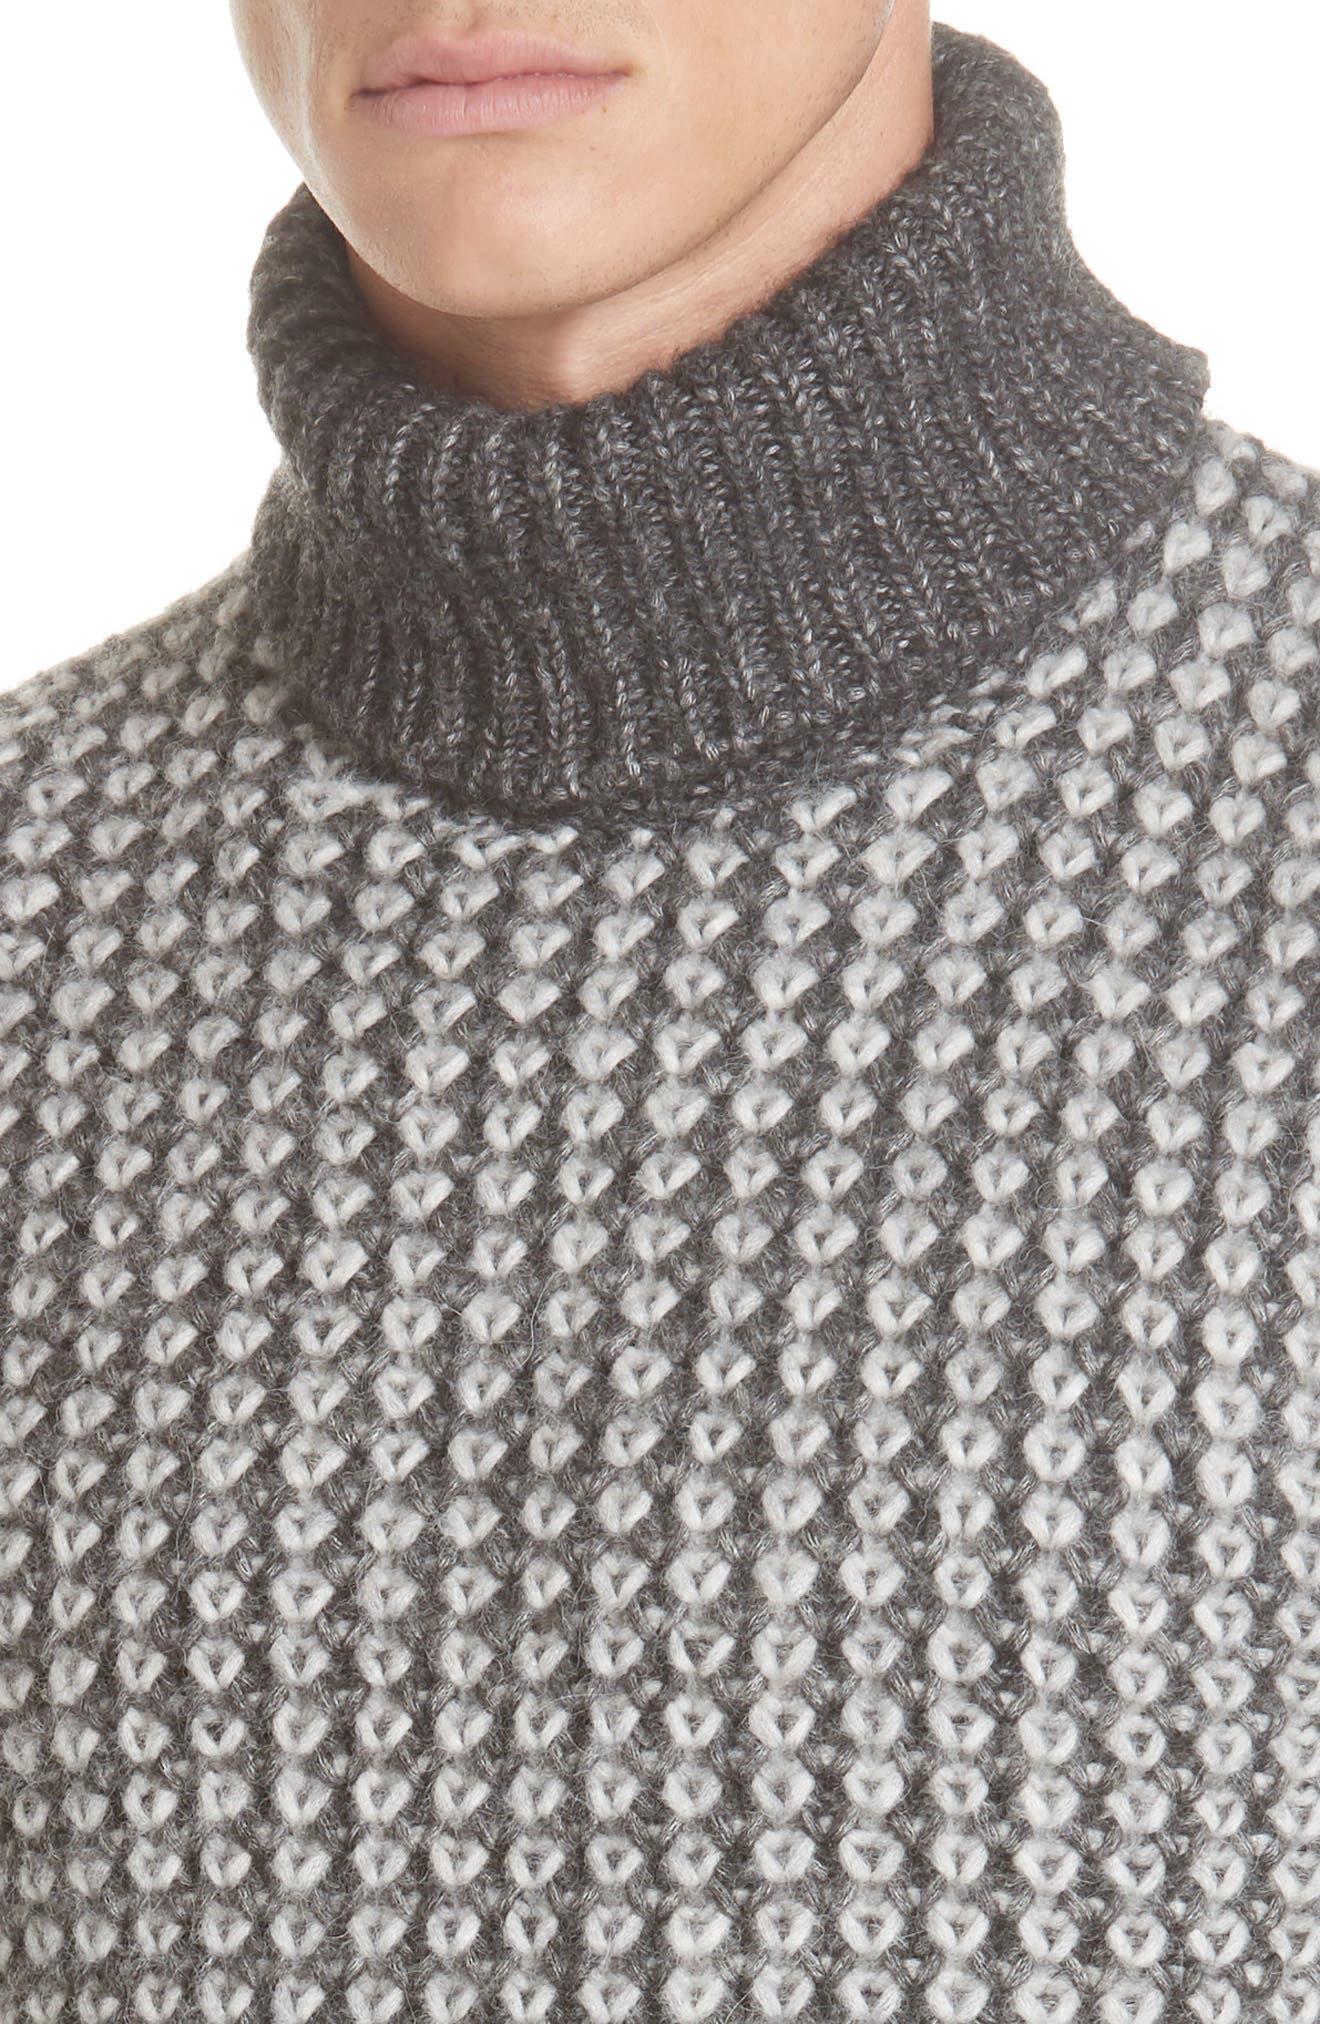 Cotton Blend Turtleneck Sweater,                             Alternate thumbnail 4, color,                             GREY